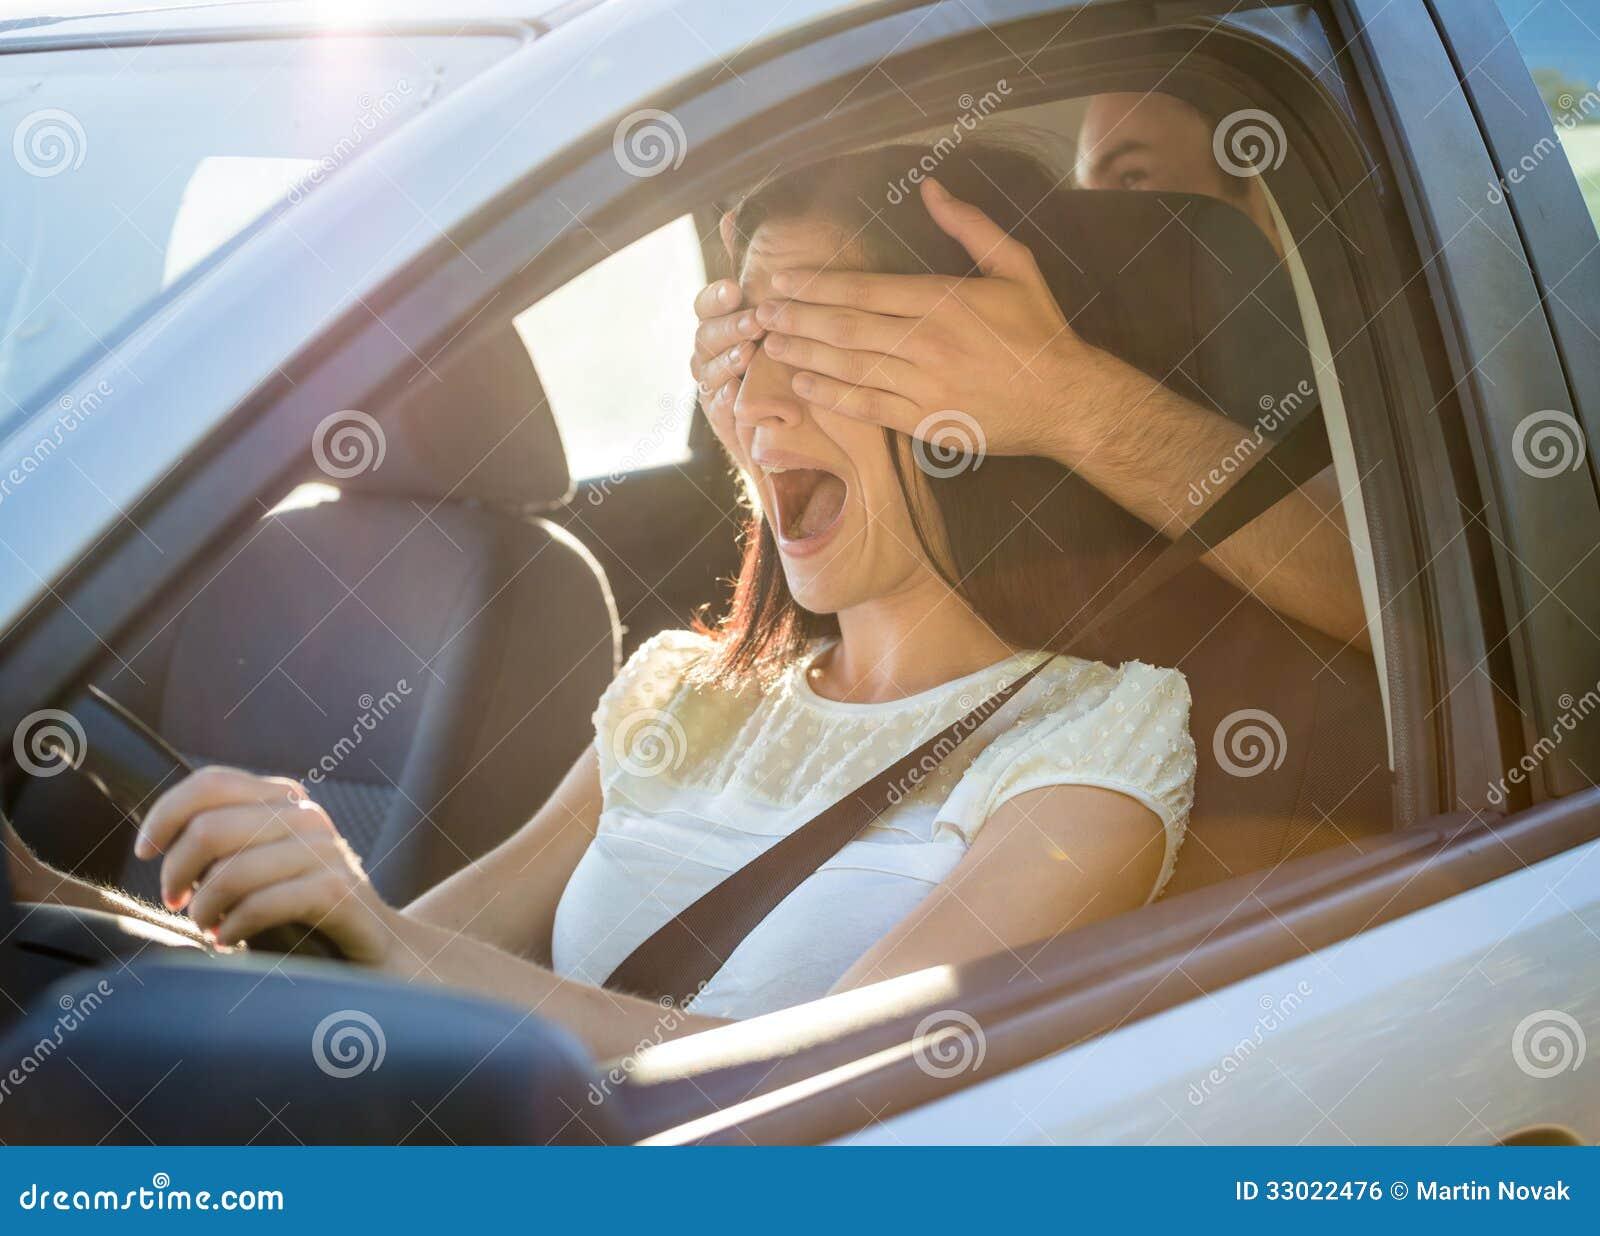 My strange addiction i dating my car